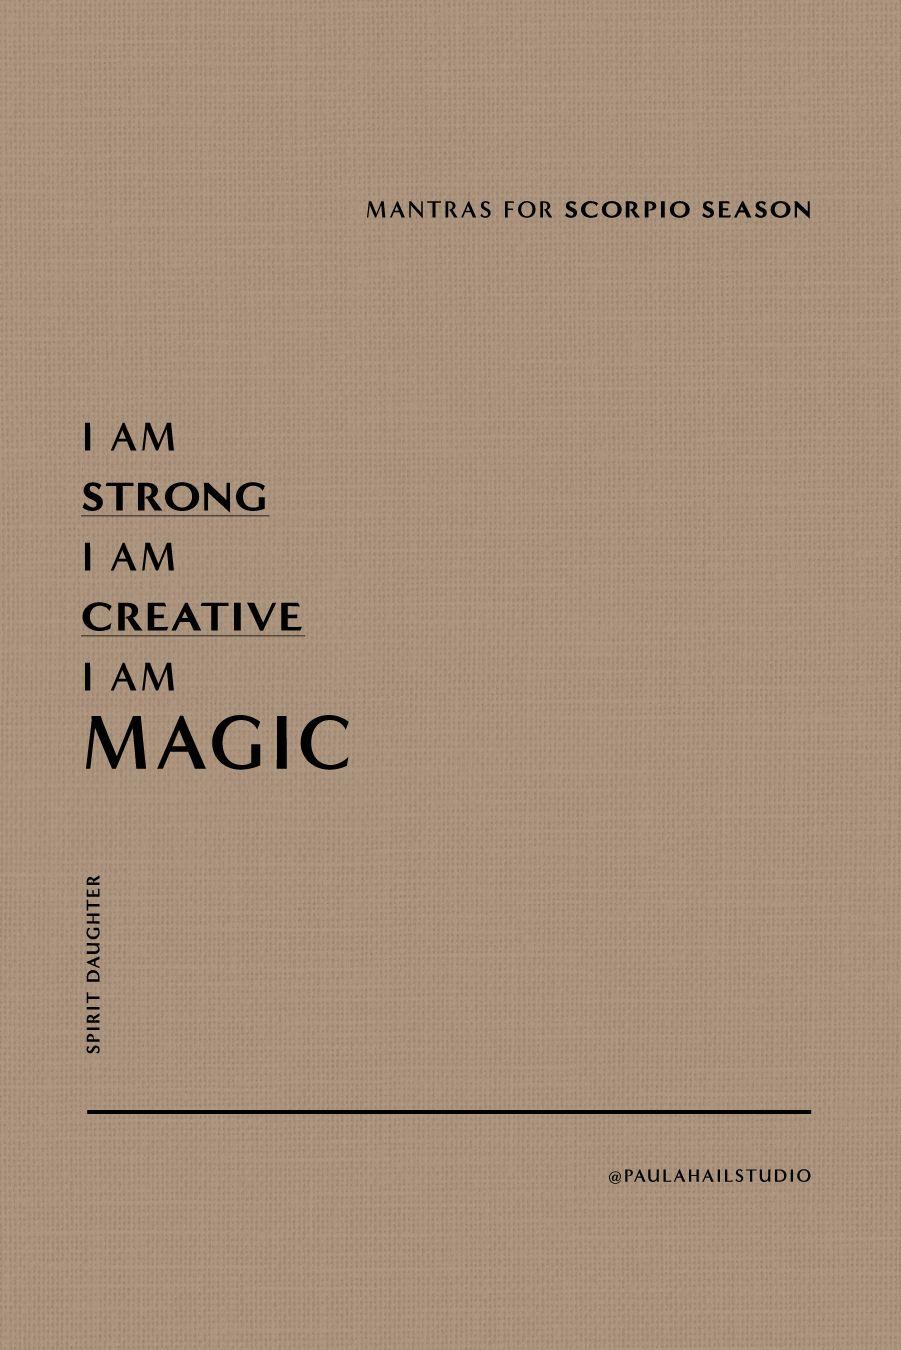 I am strong I am creative I am MAGIC - Paula Hail Studio - Scorpio Season Mantras #mantra #affirm